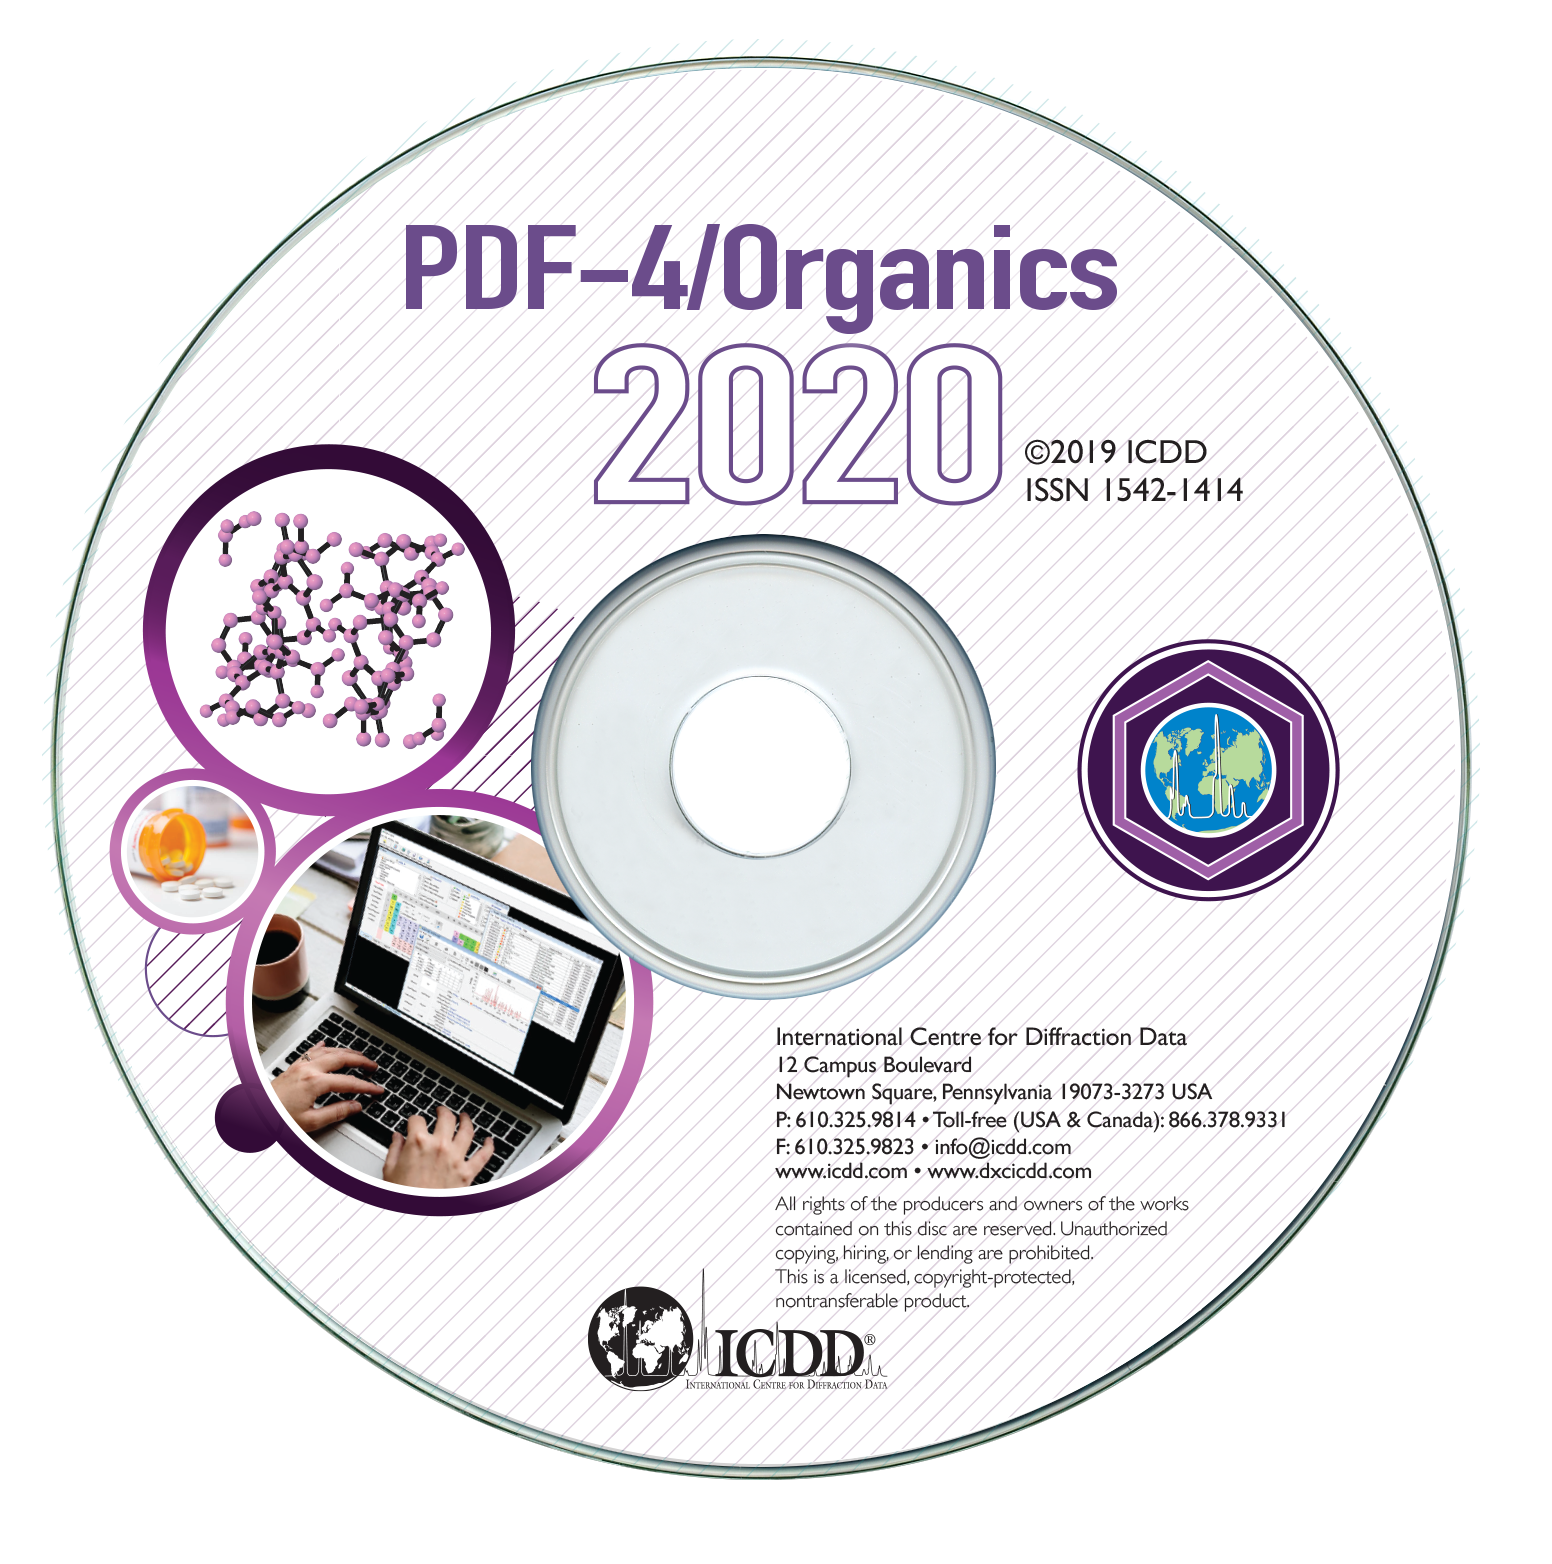 PDF-4 2020有机物卡片数据库卡片